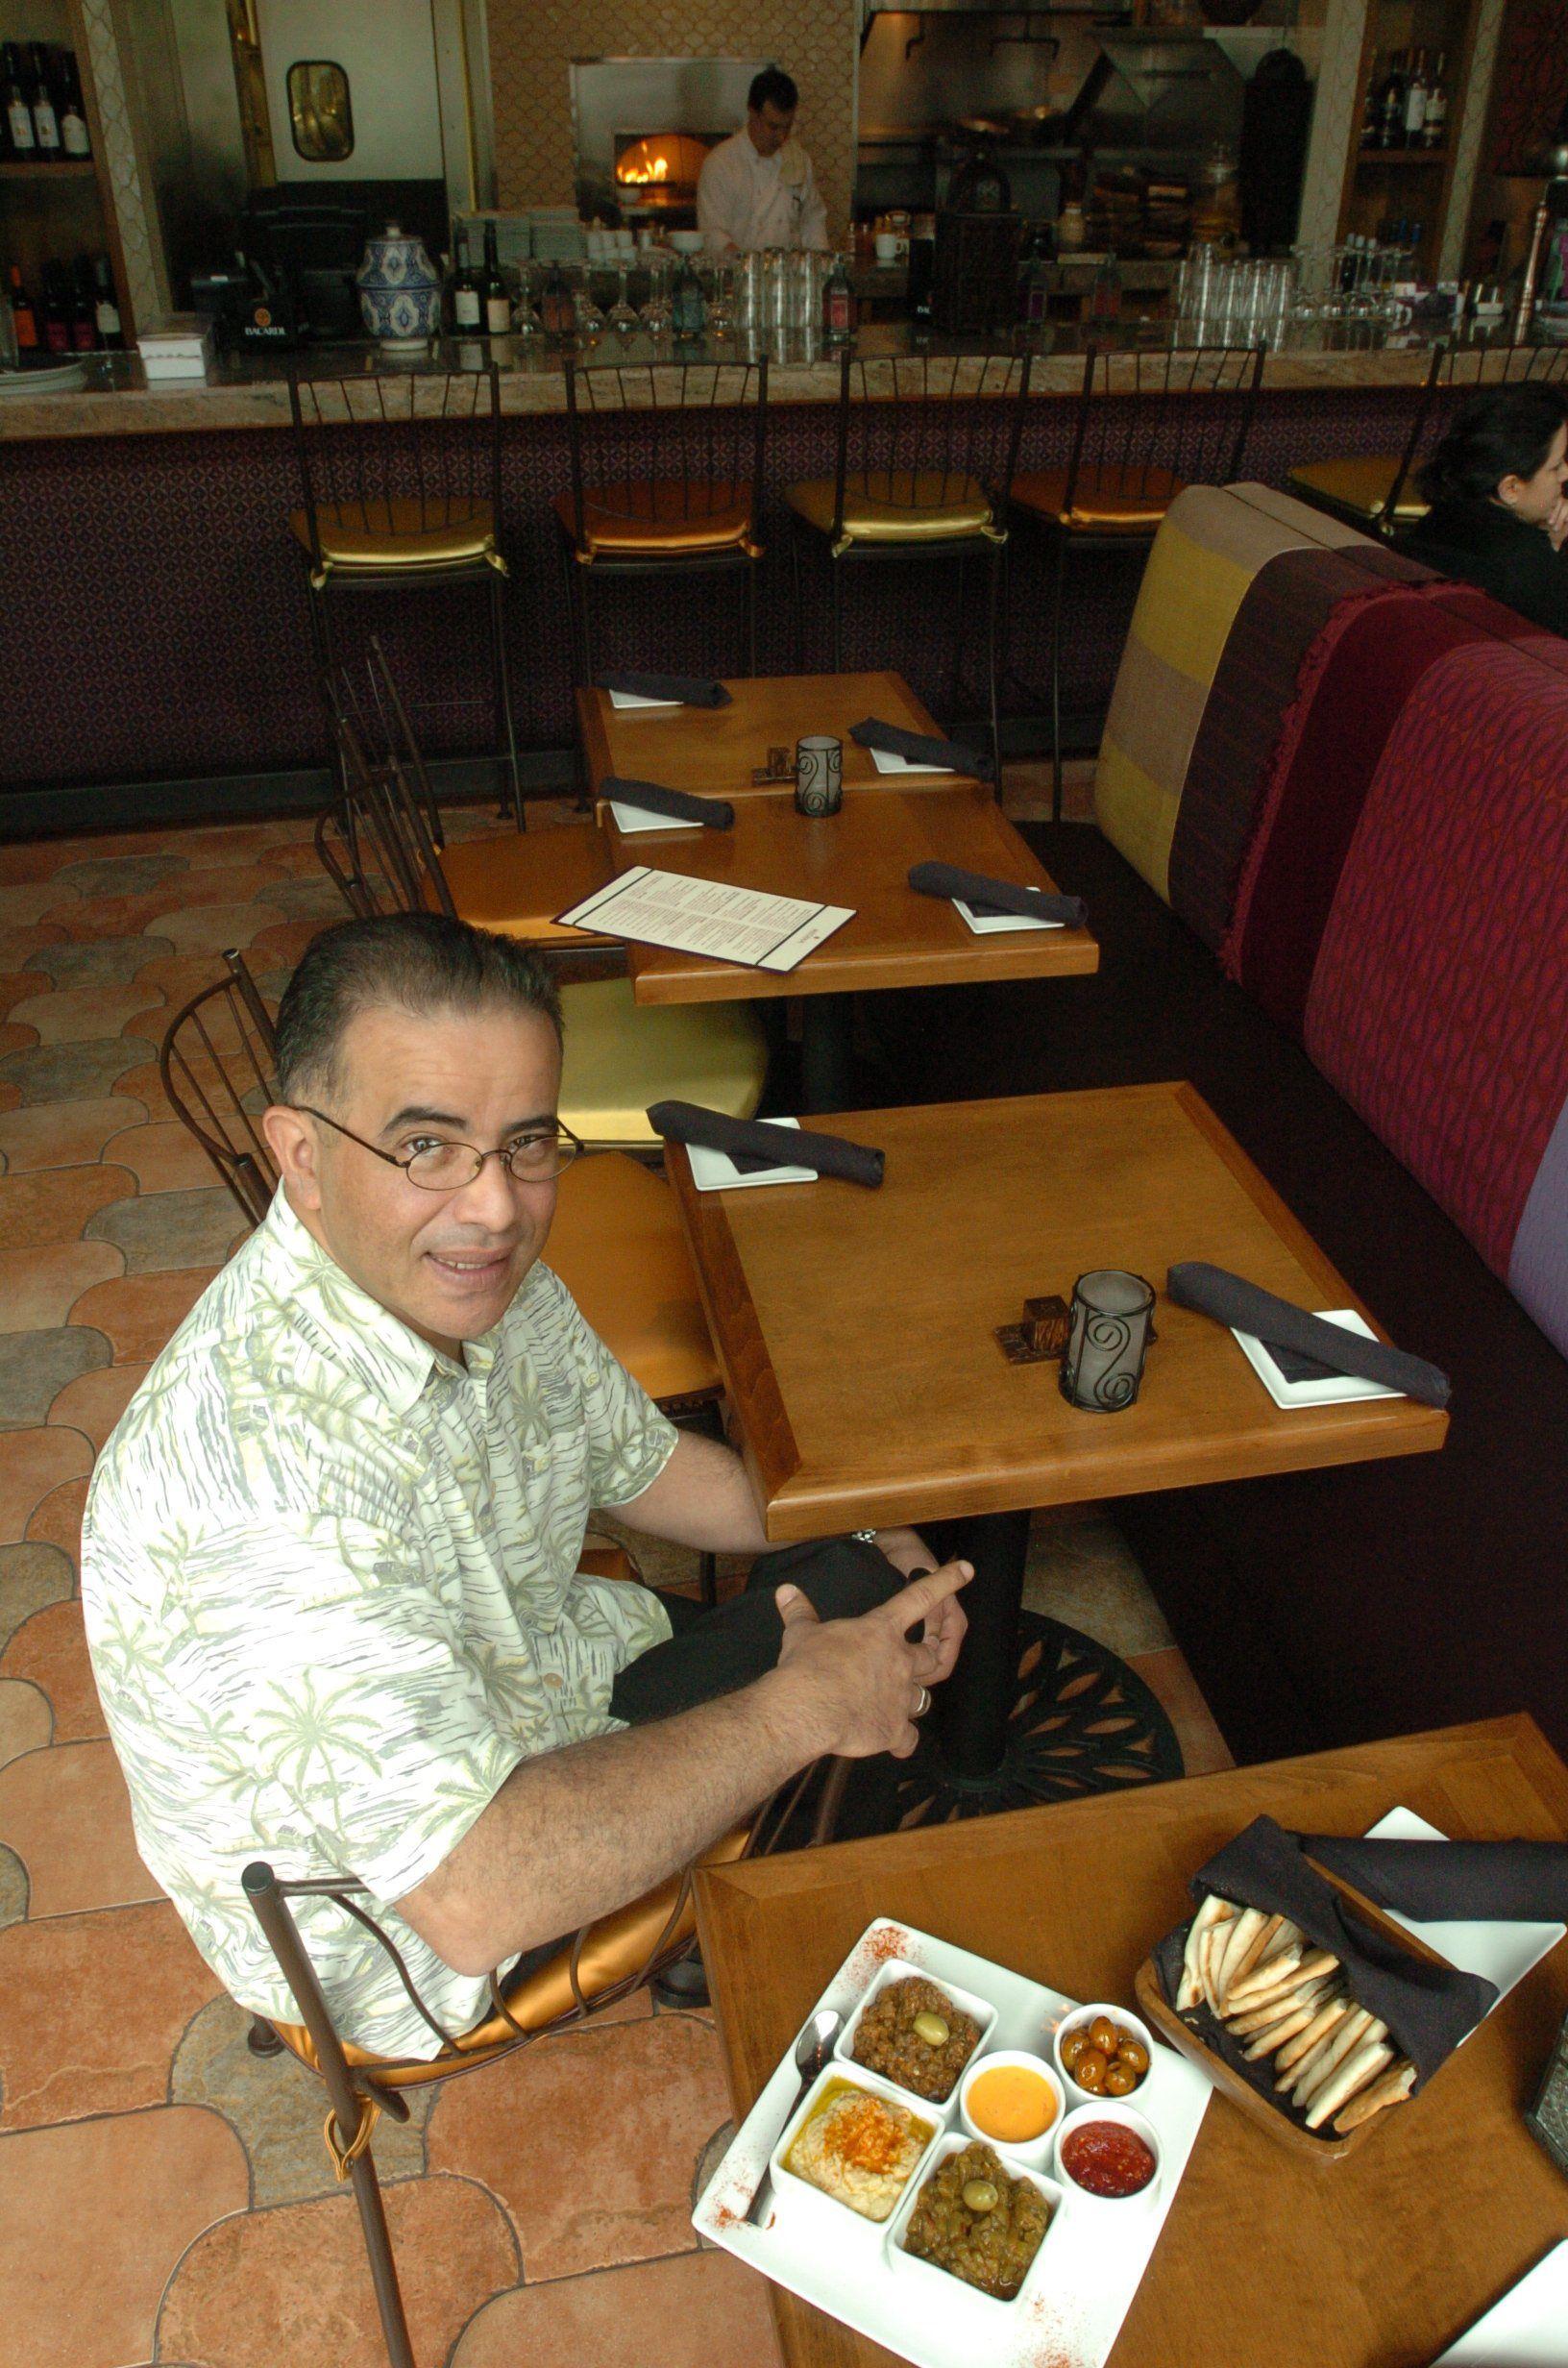 Sam Benoikken in 2009 at his restaurant, Medina Oven & Bar.